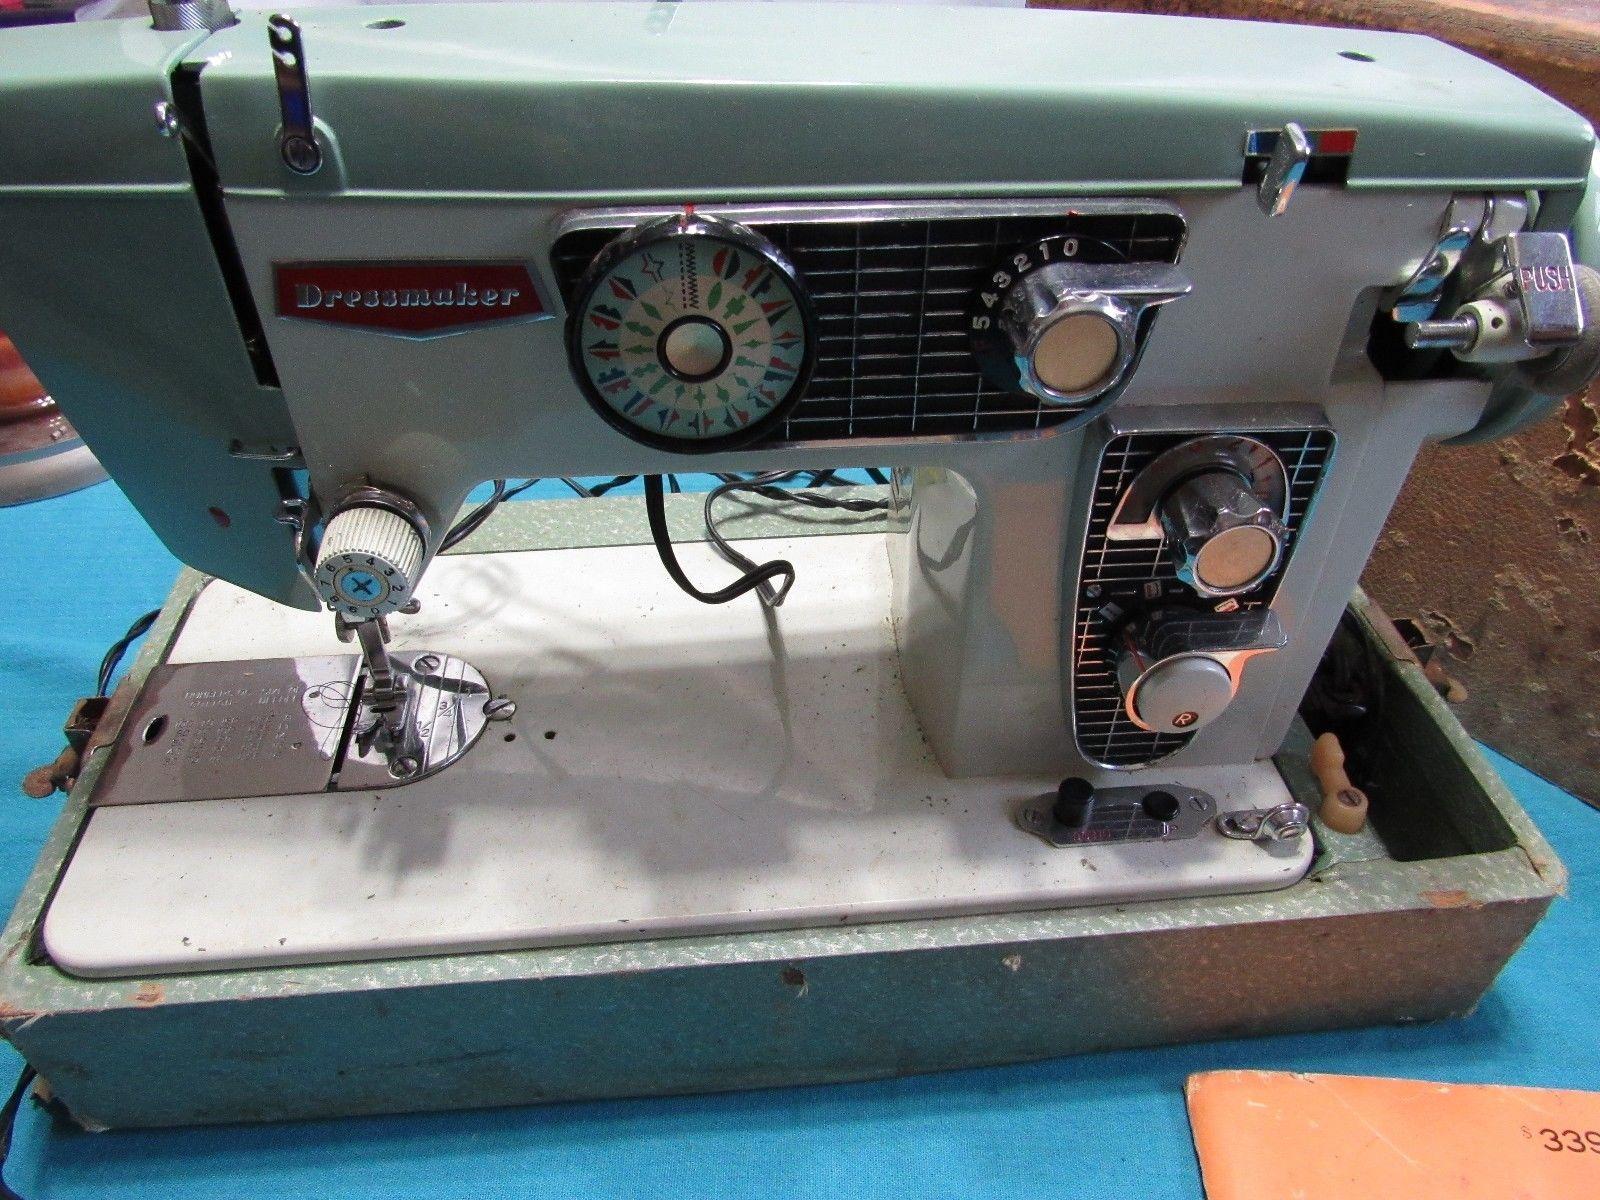 Dressmaker Heavy Duty Sewing Machine (high shank) Model 950 B Embroidery  Upholstery Riccar | eBay